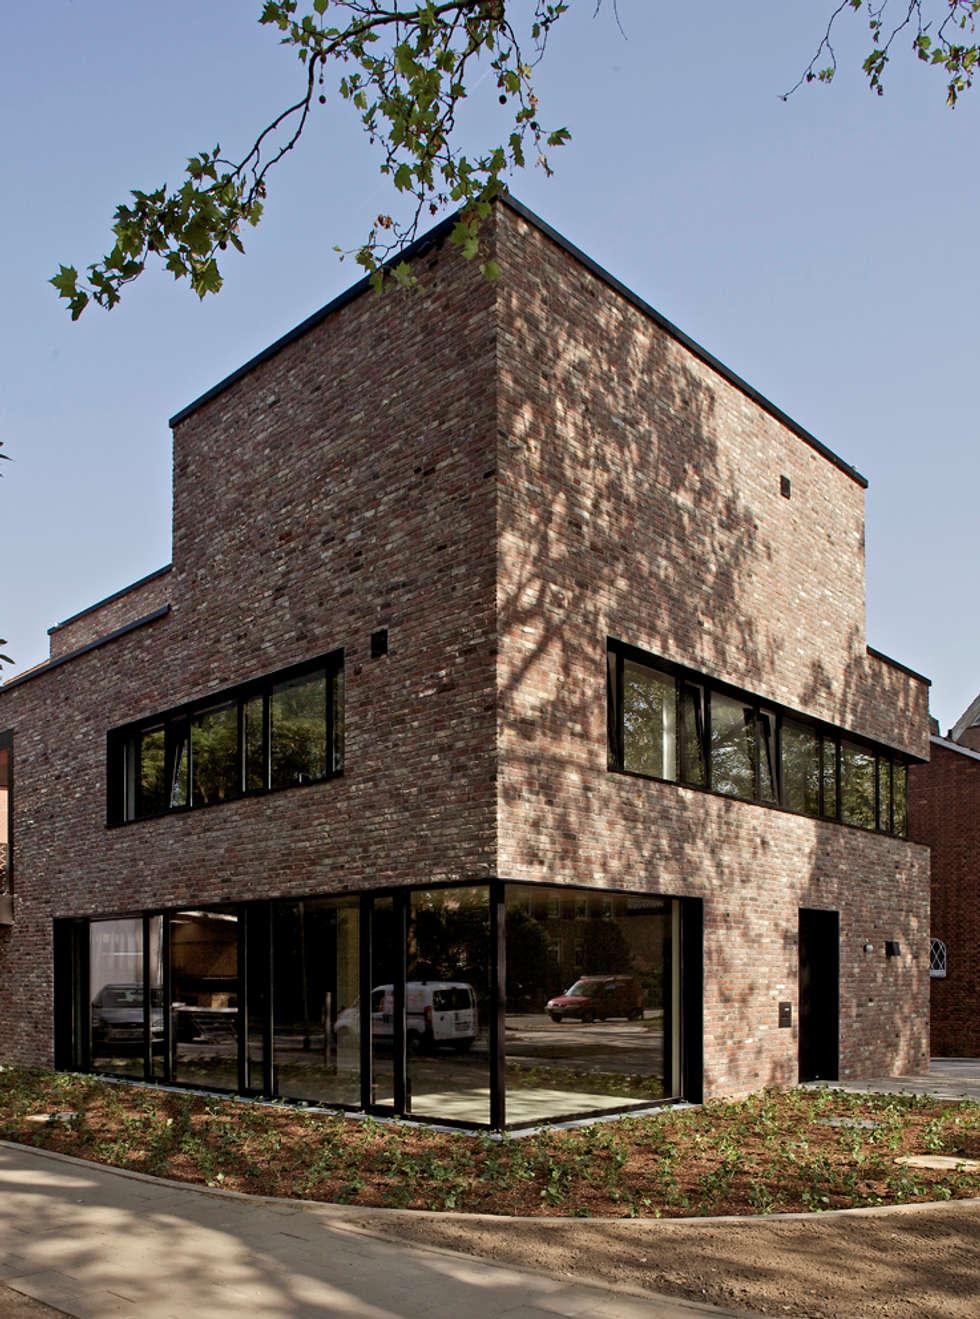 Homify - Heupel architekten ...